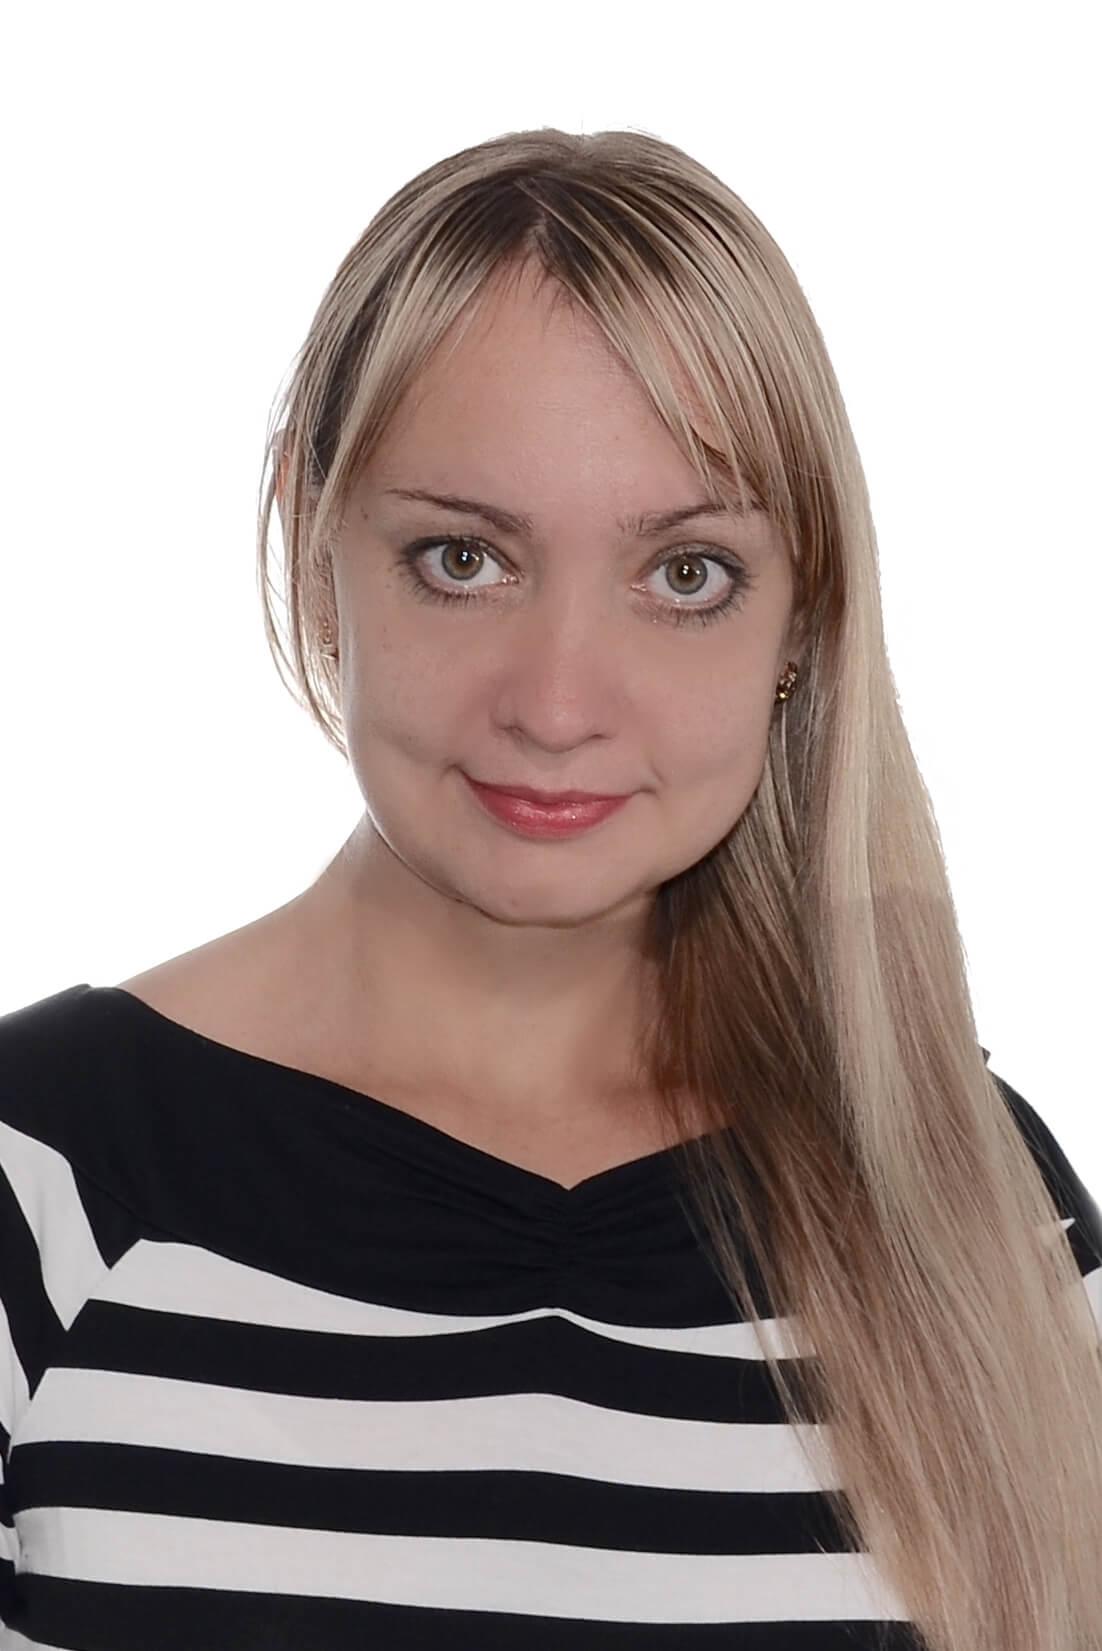 María Khivratova